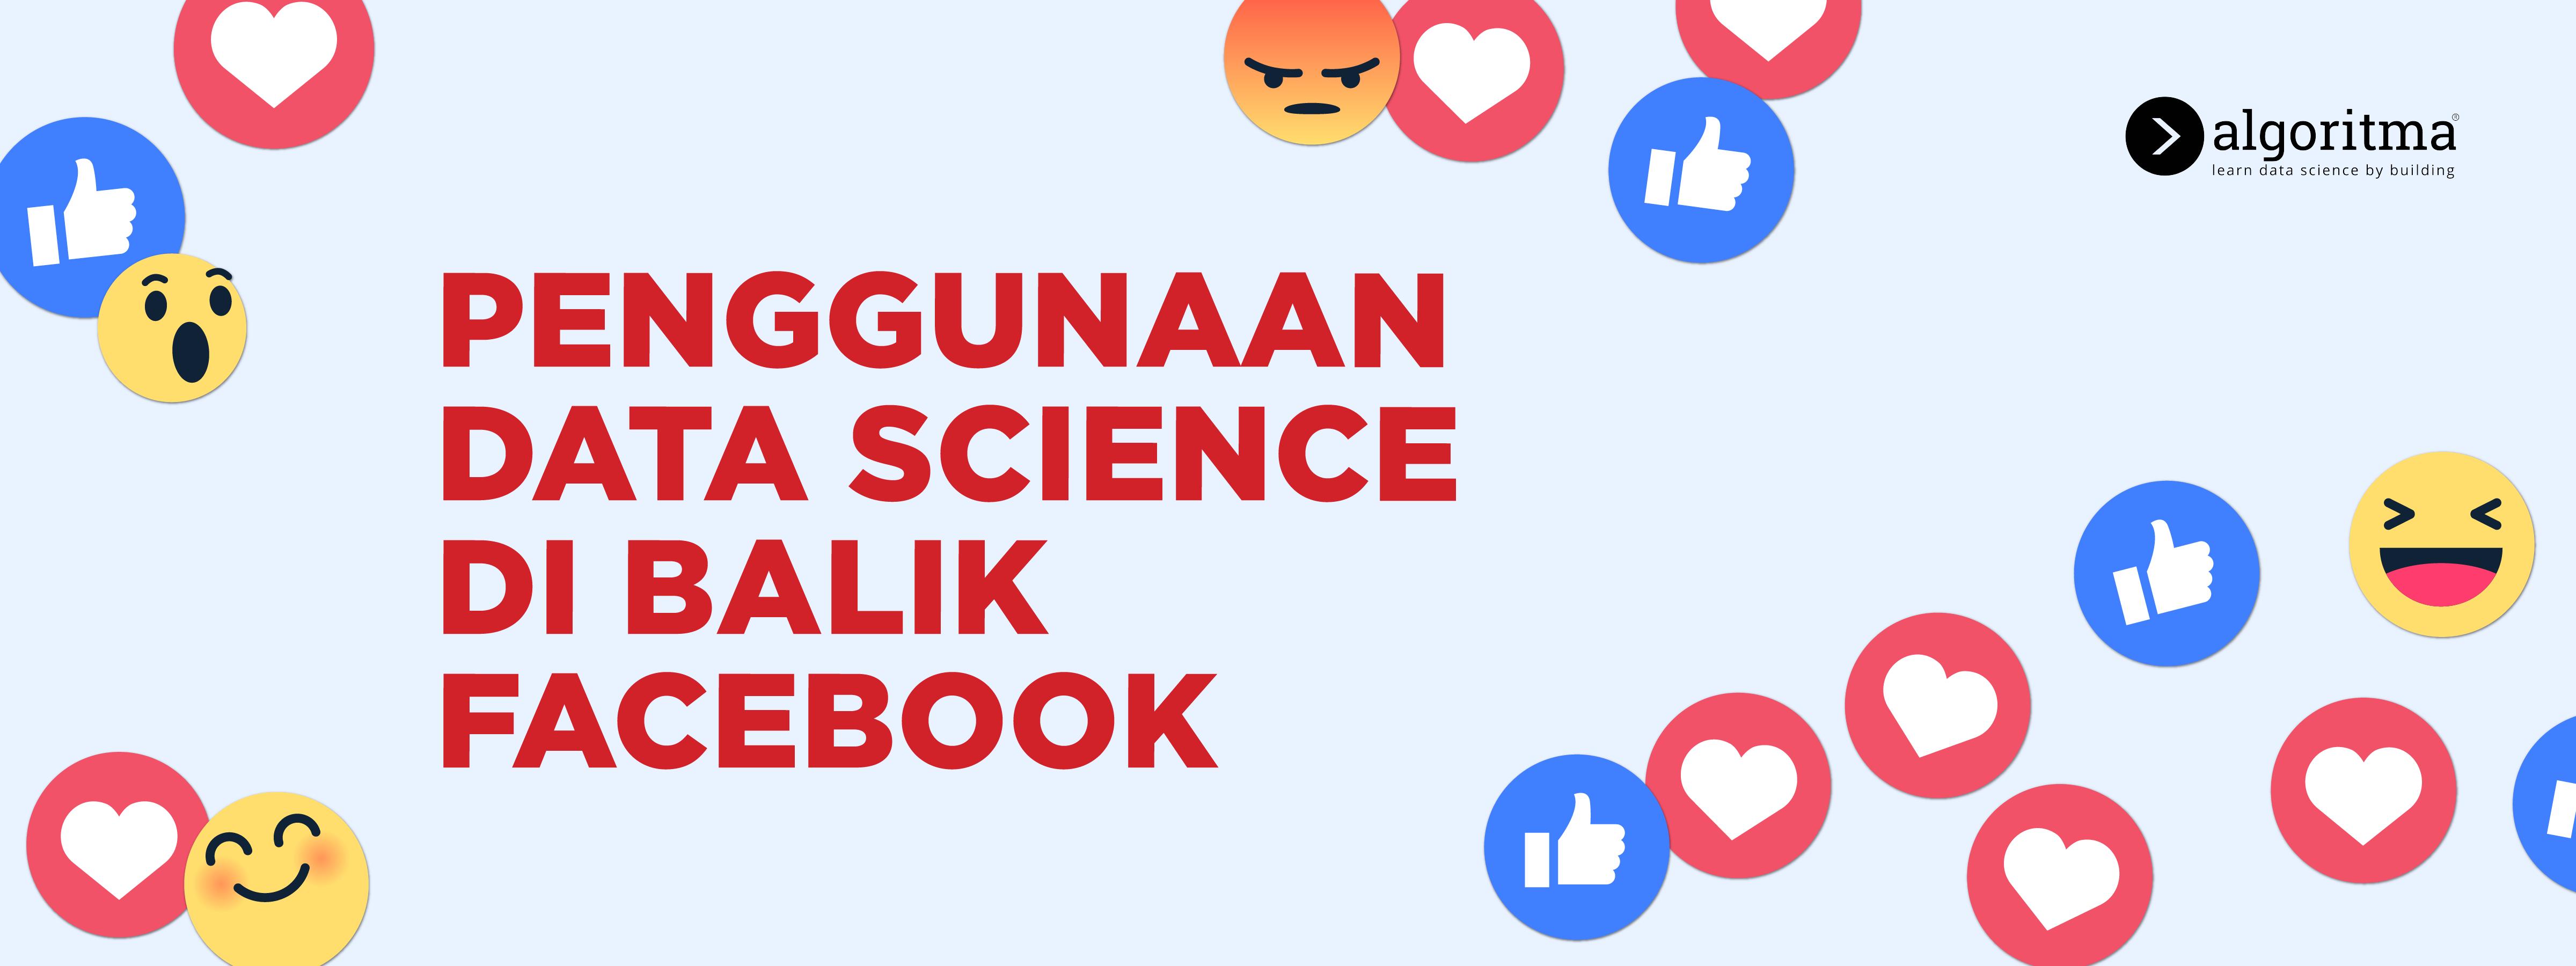 Manfaat Data Science Dibalik Facebook